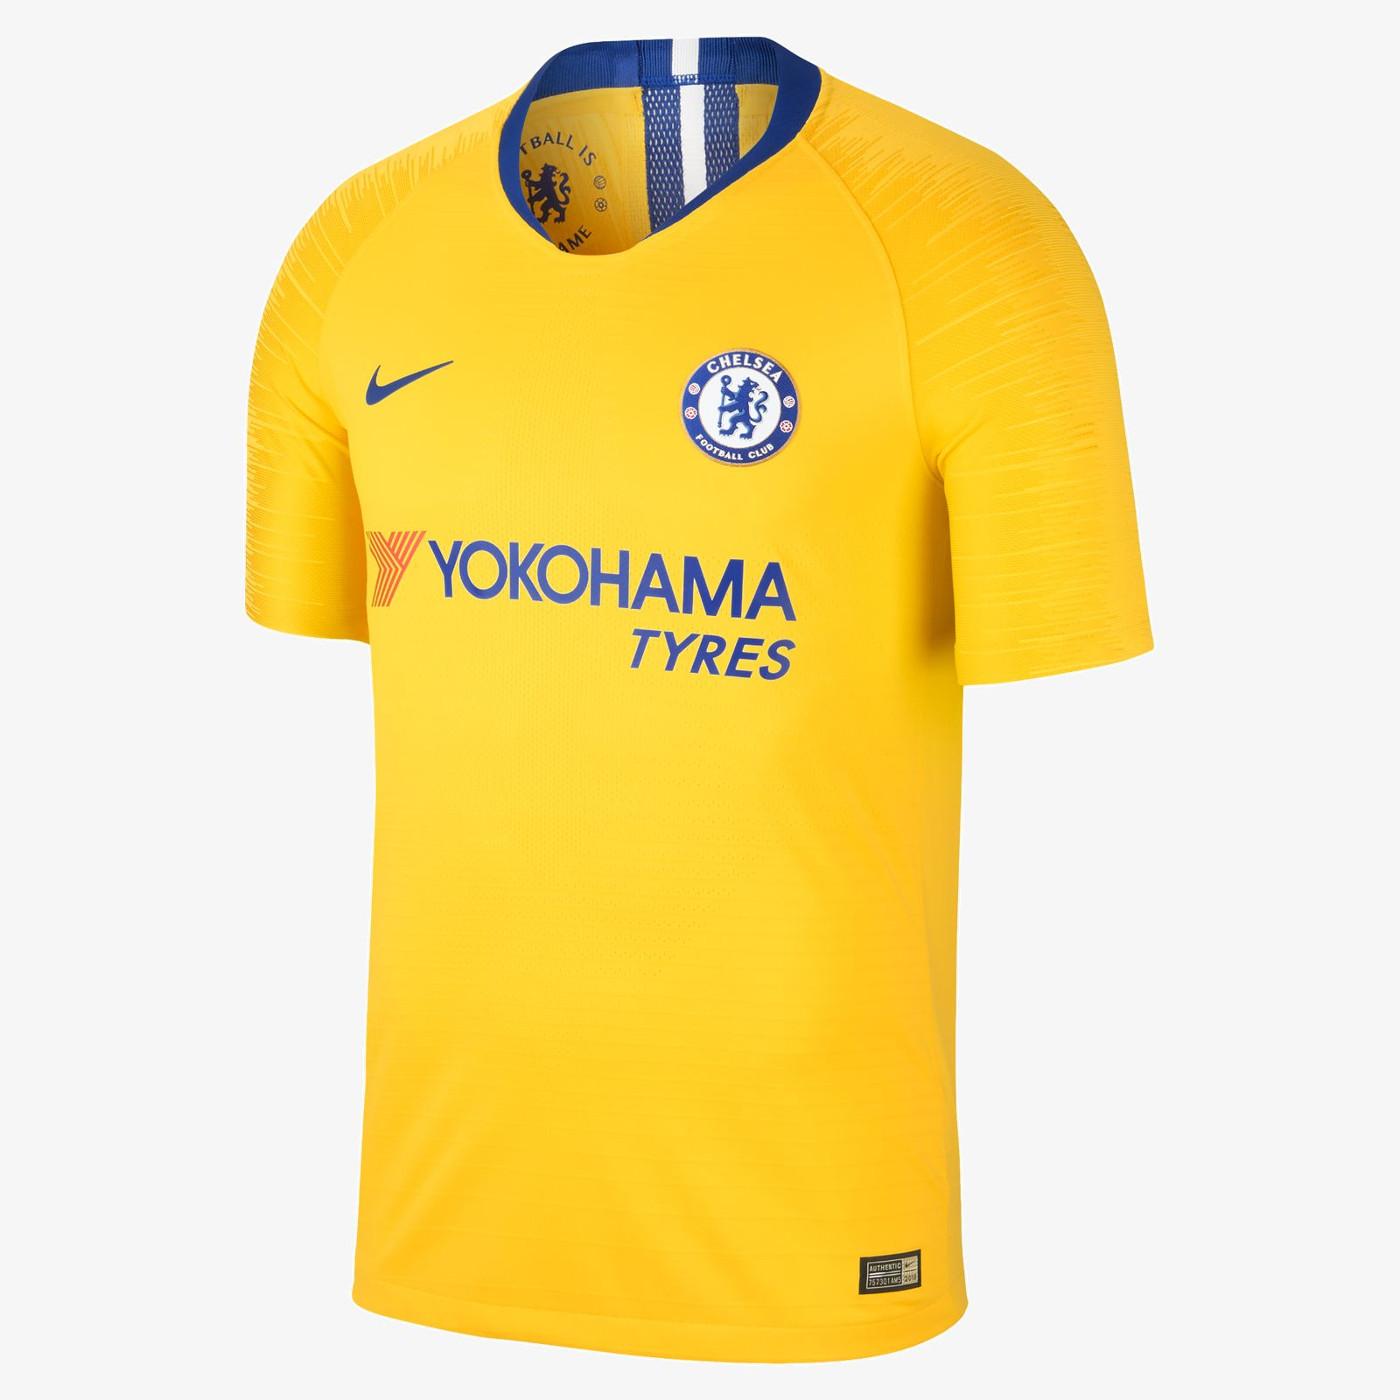 Maglia Chelsea 2018-2019, Nike rispolvera le pinstripes annni '80